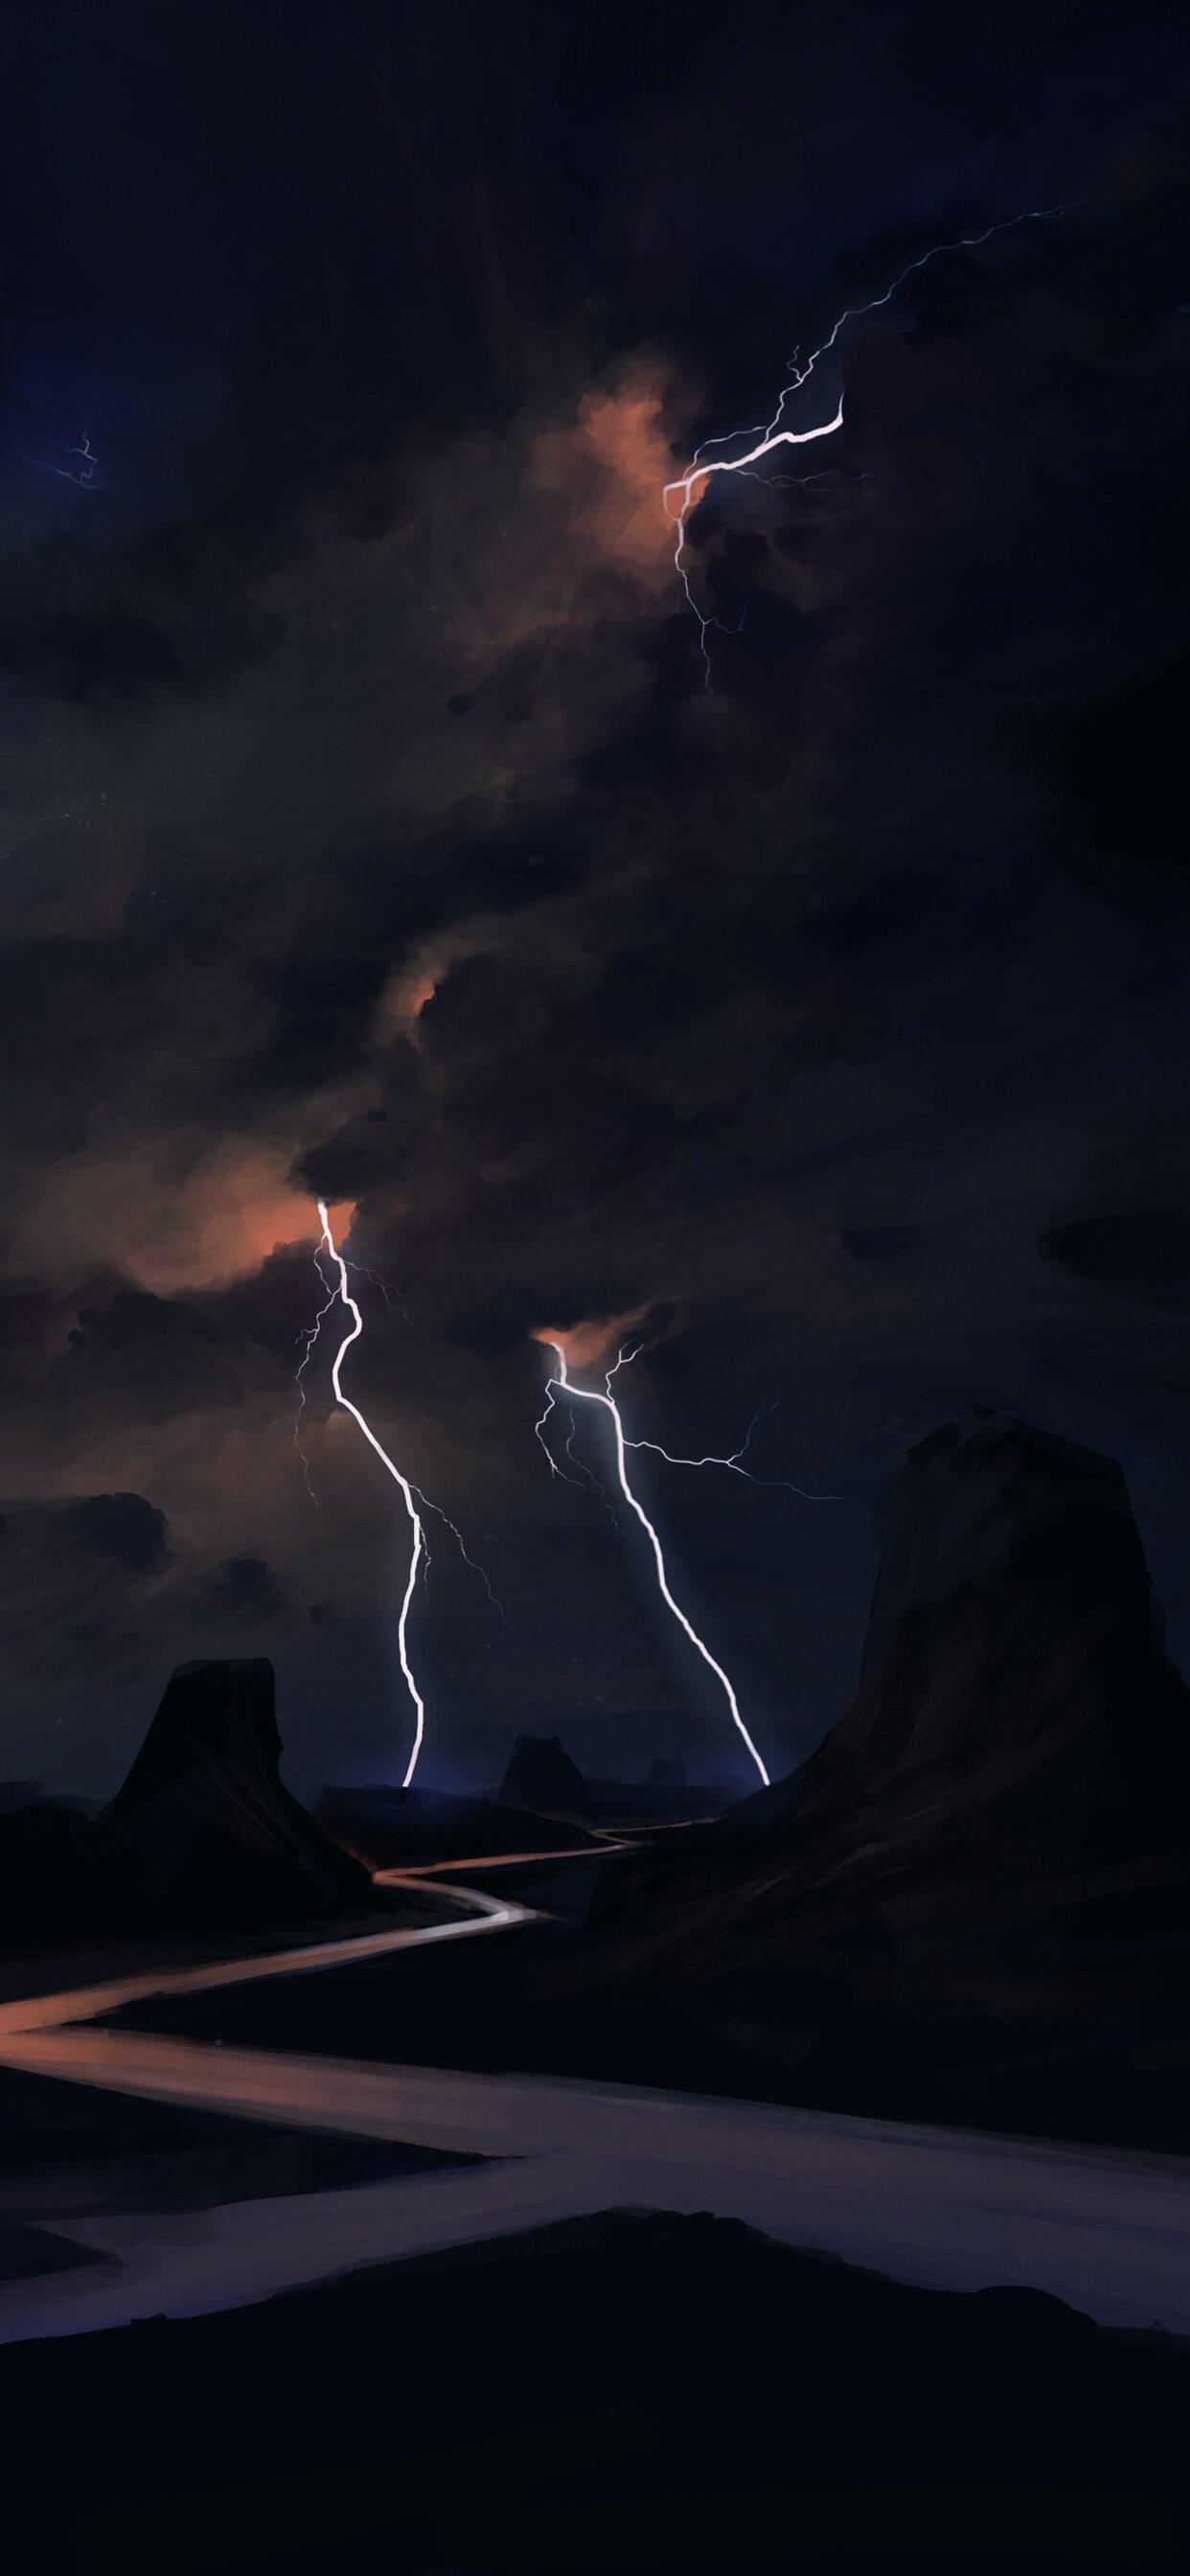 Lightning Wallpaper 4k Iphone